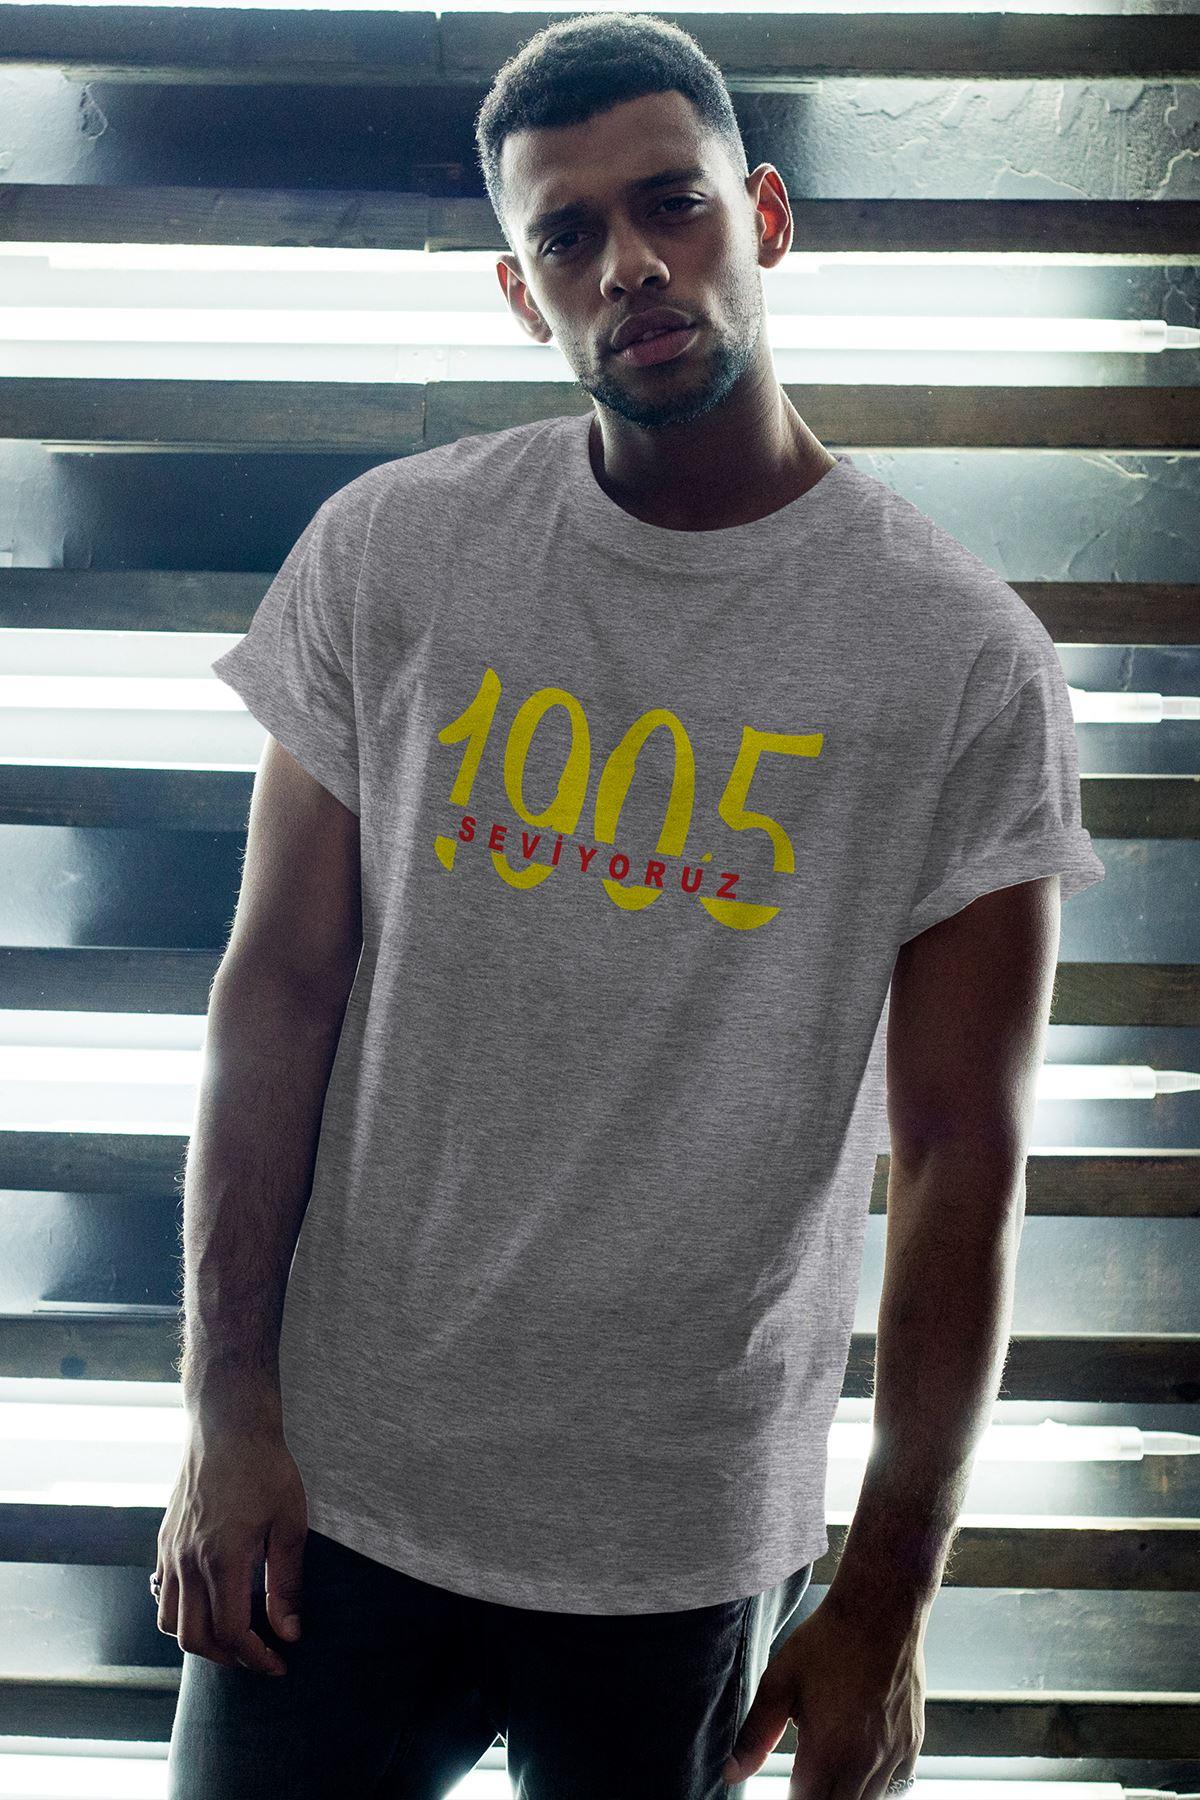 1905-2 GS Gri Erkek Oversize Tshirt - Tişört